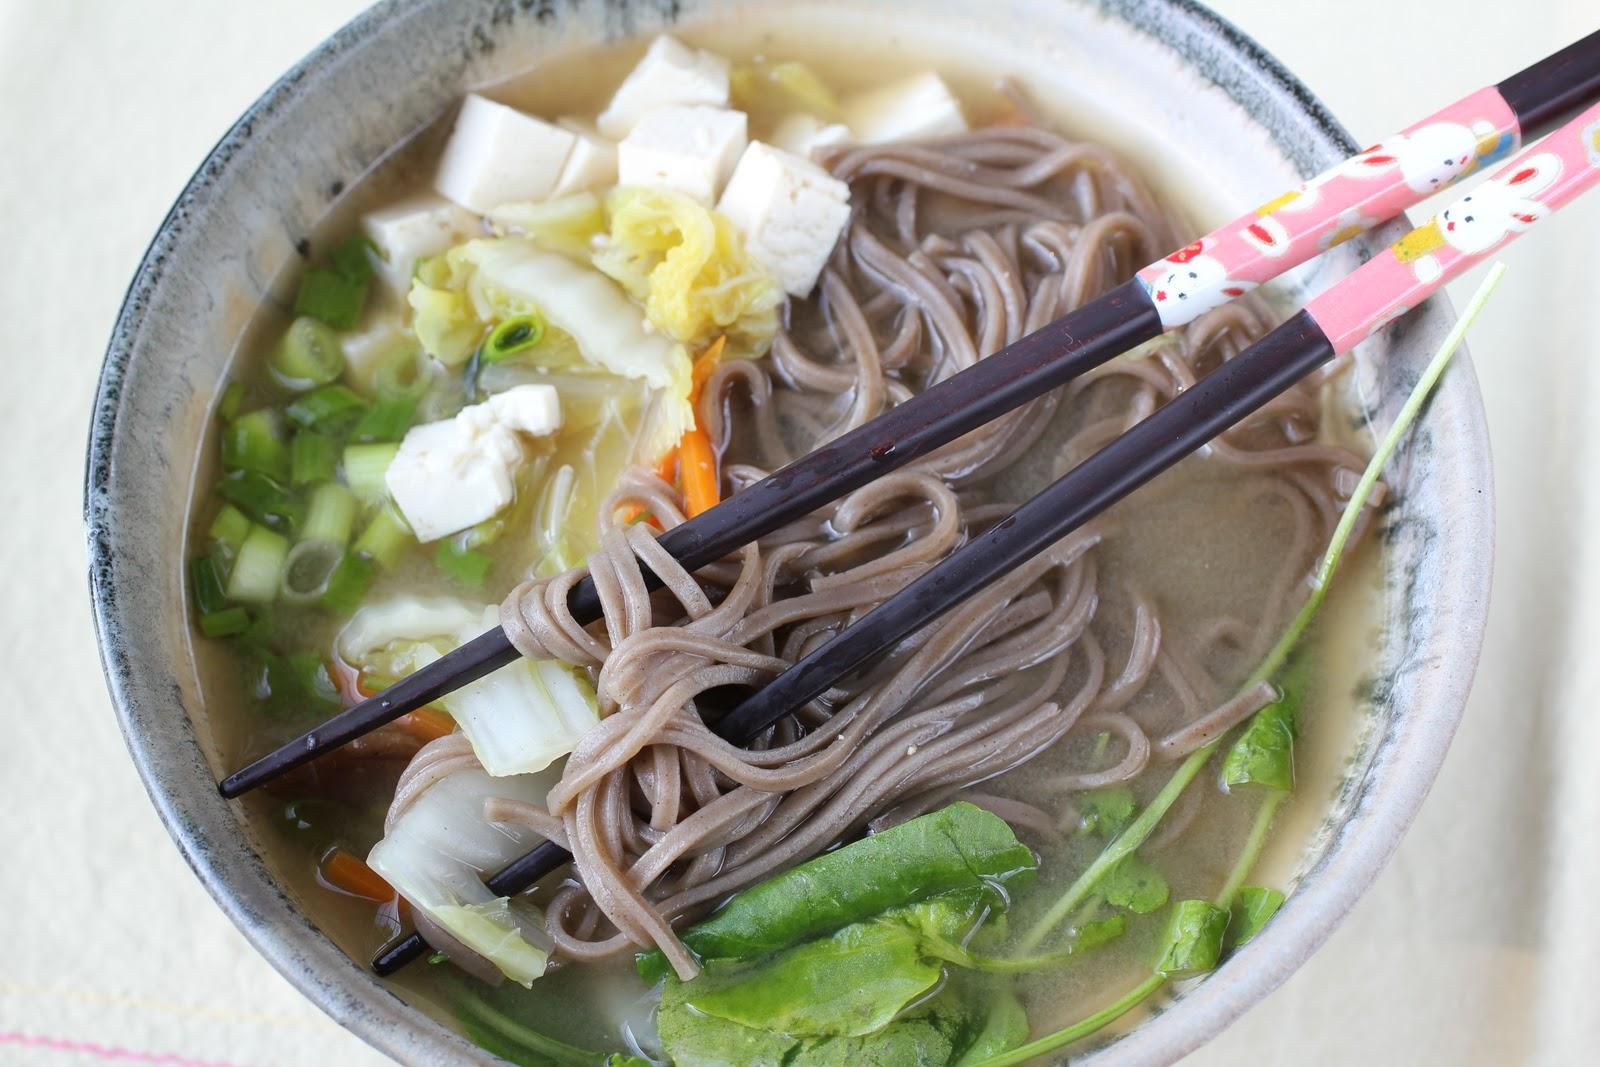 Как приготовить мисо суп в домашних условиях фото